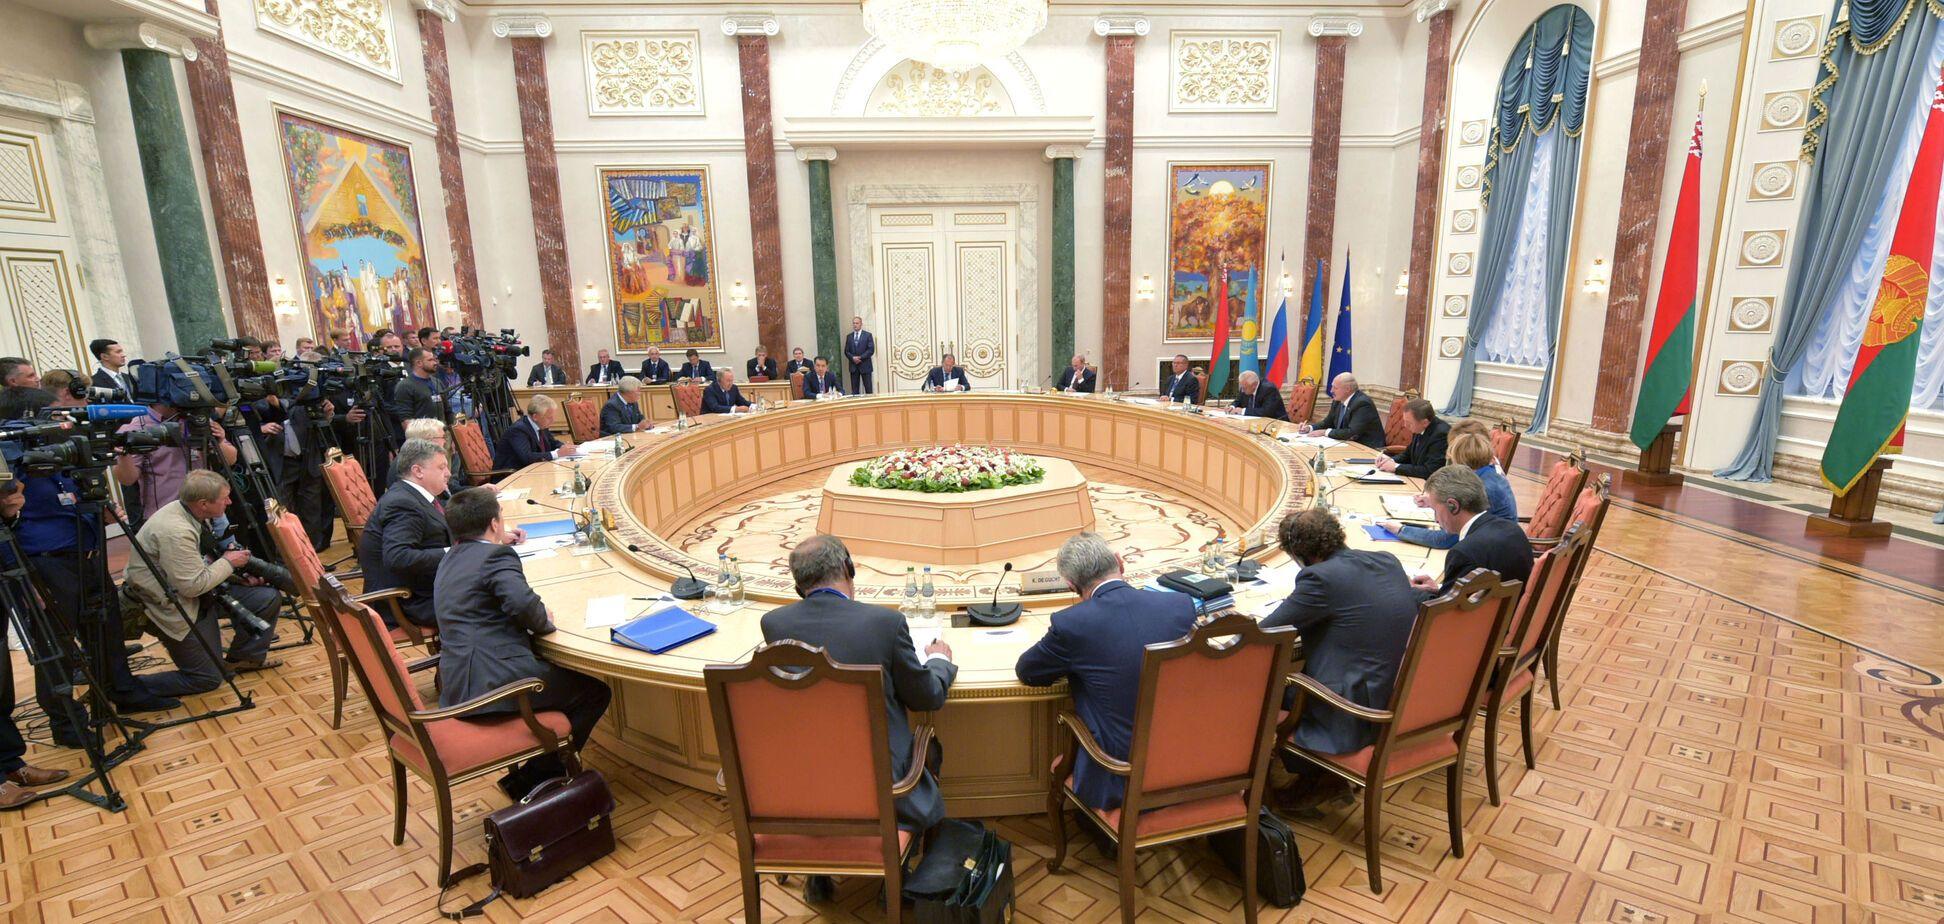 Предложение Трампа по Донбассу: в Украине озвучили минусы Минска